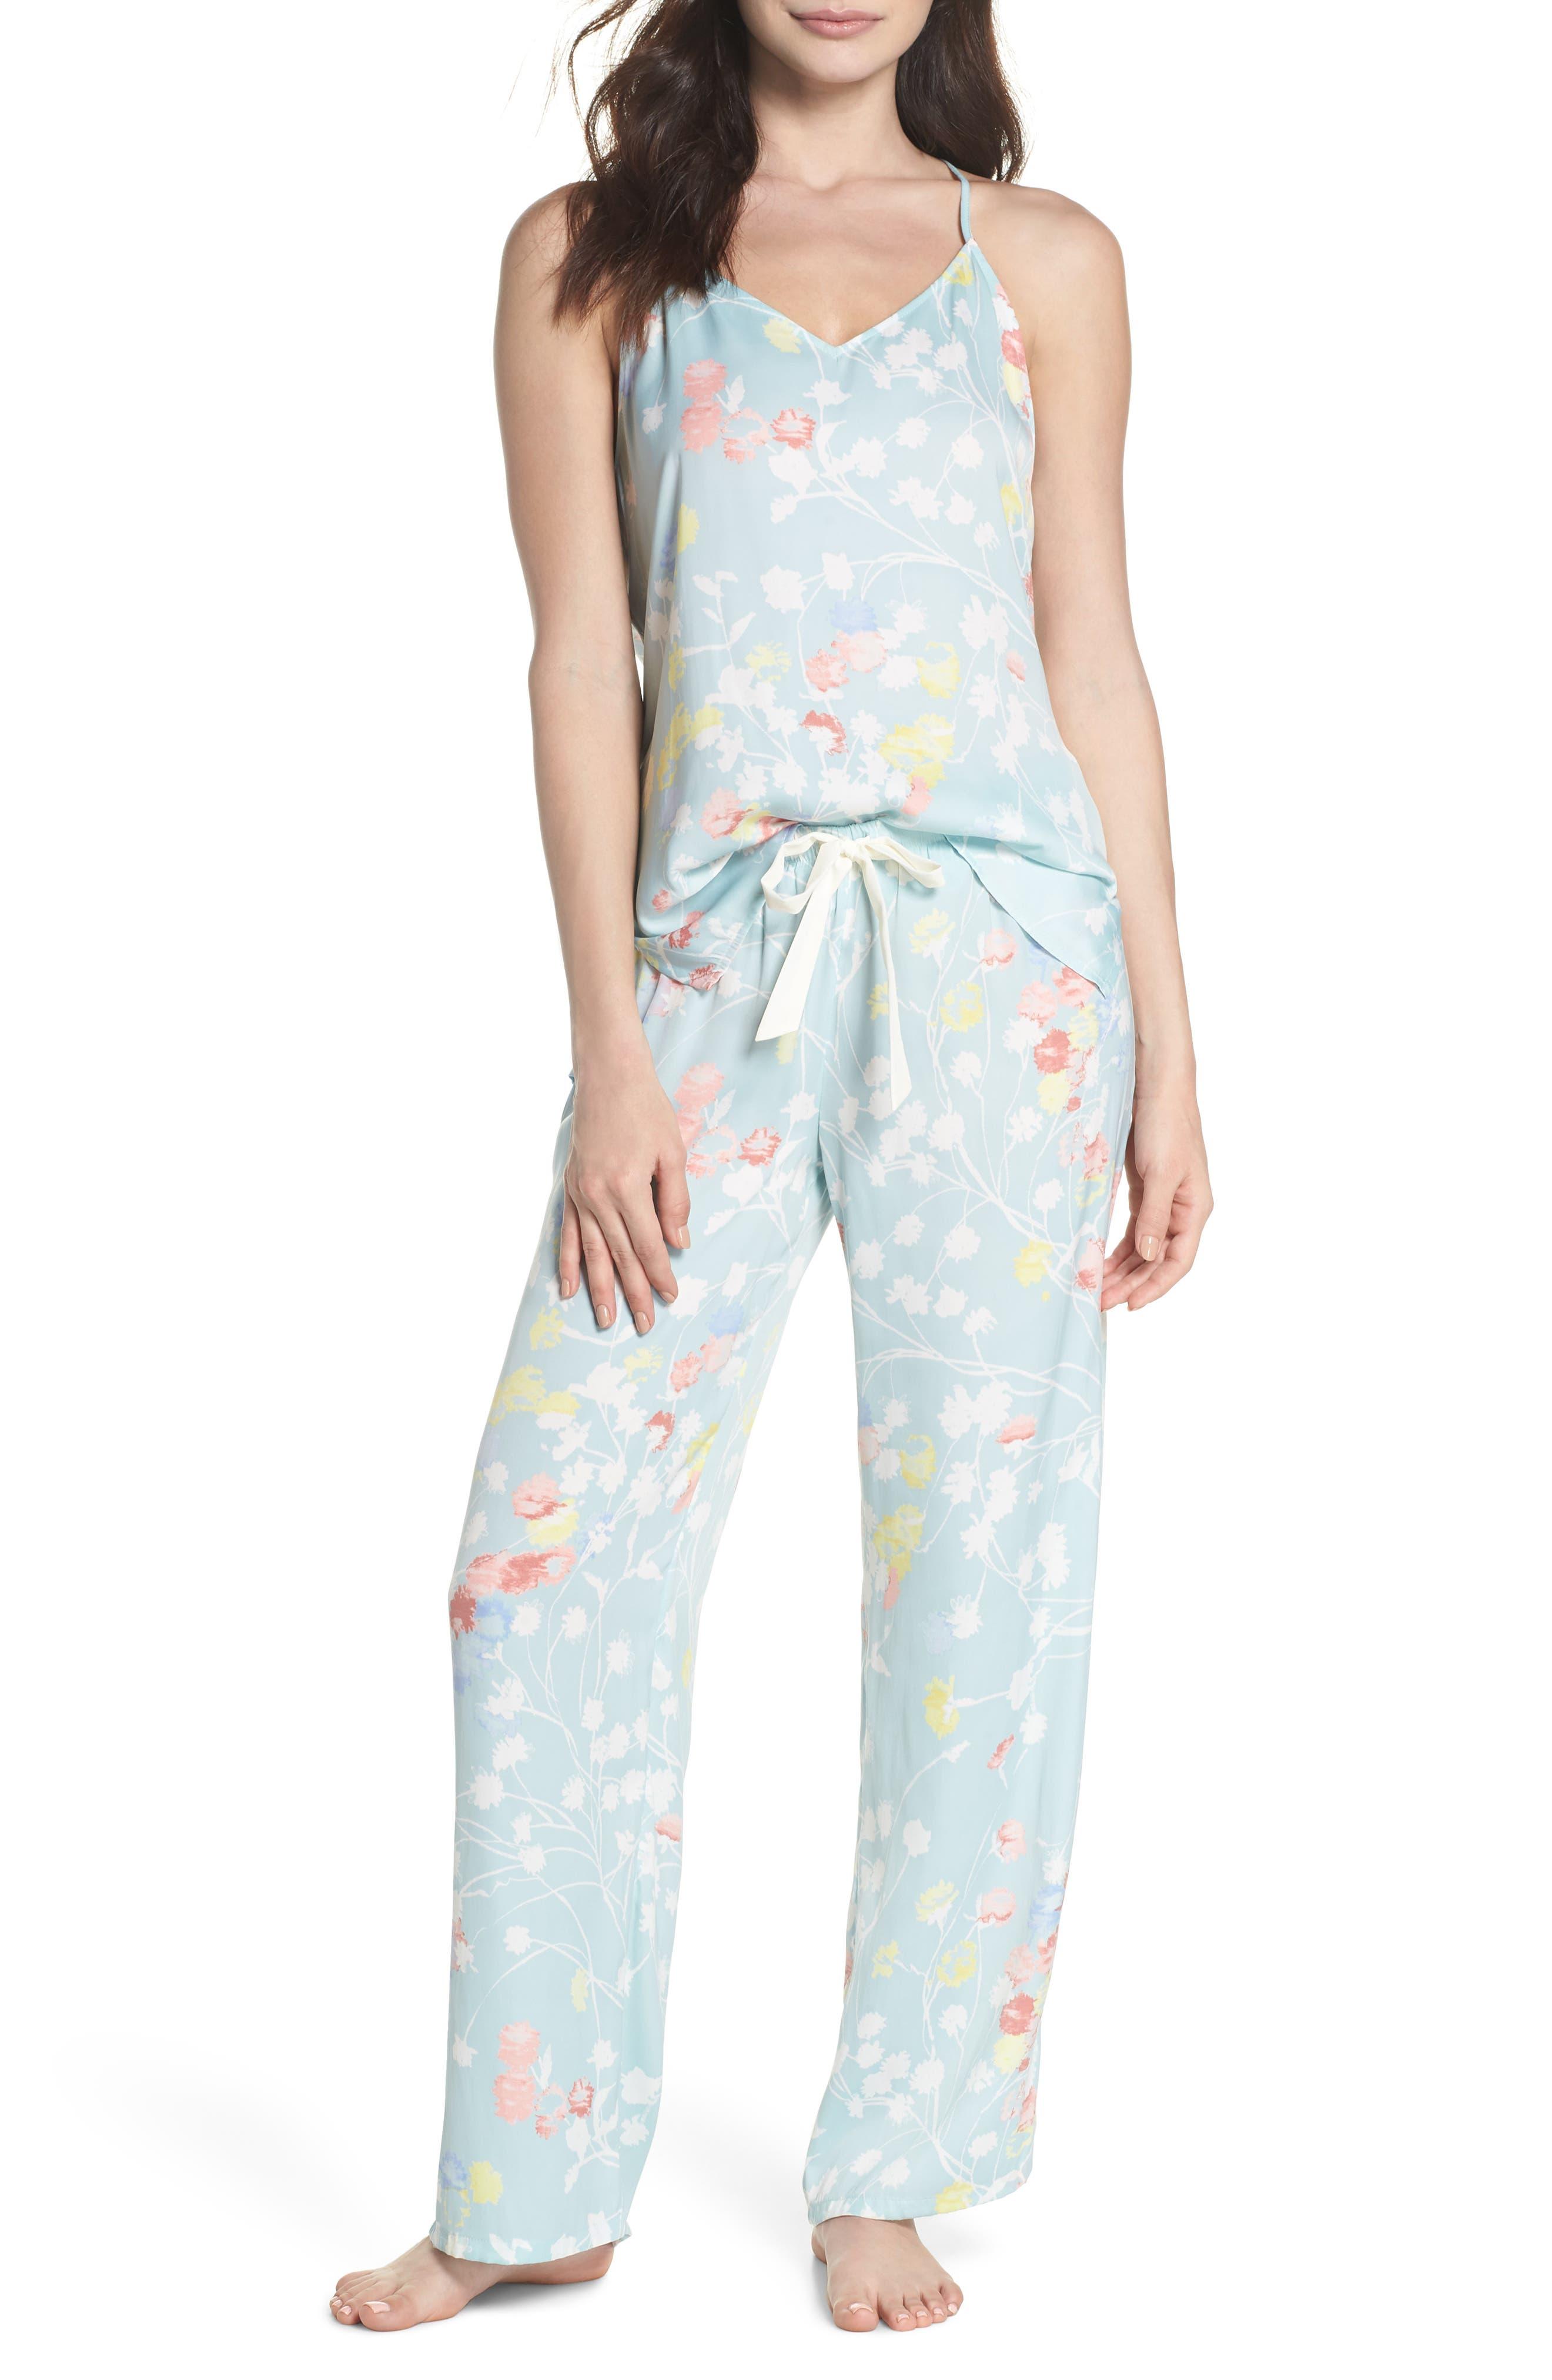 Bardot Dreamland Pajamas,                             Main thumbnail 1, color,                             Sgb Seaglass